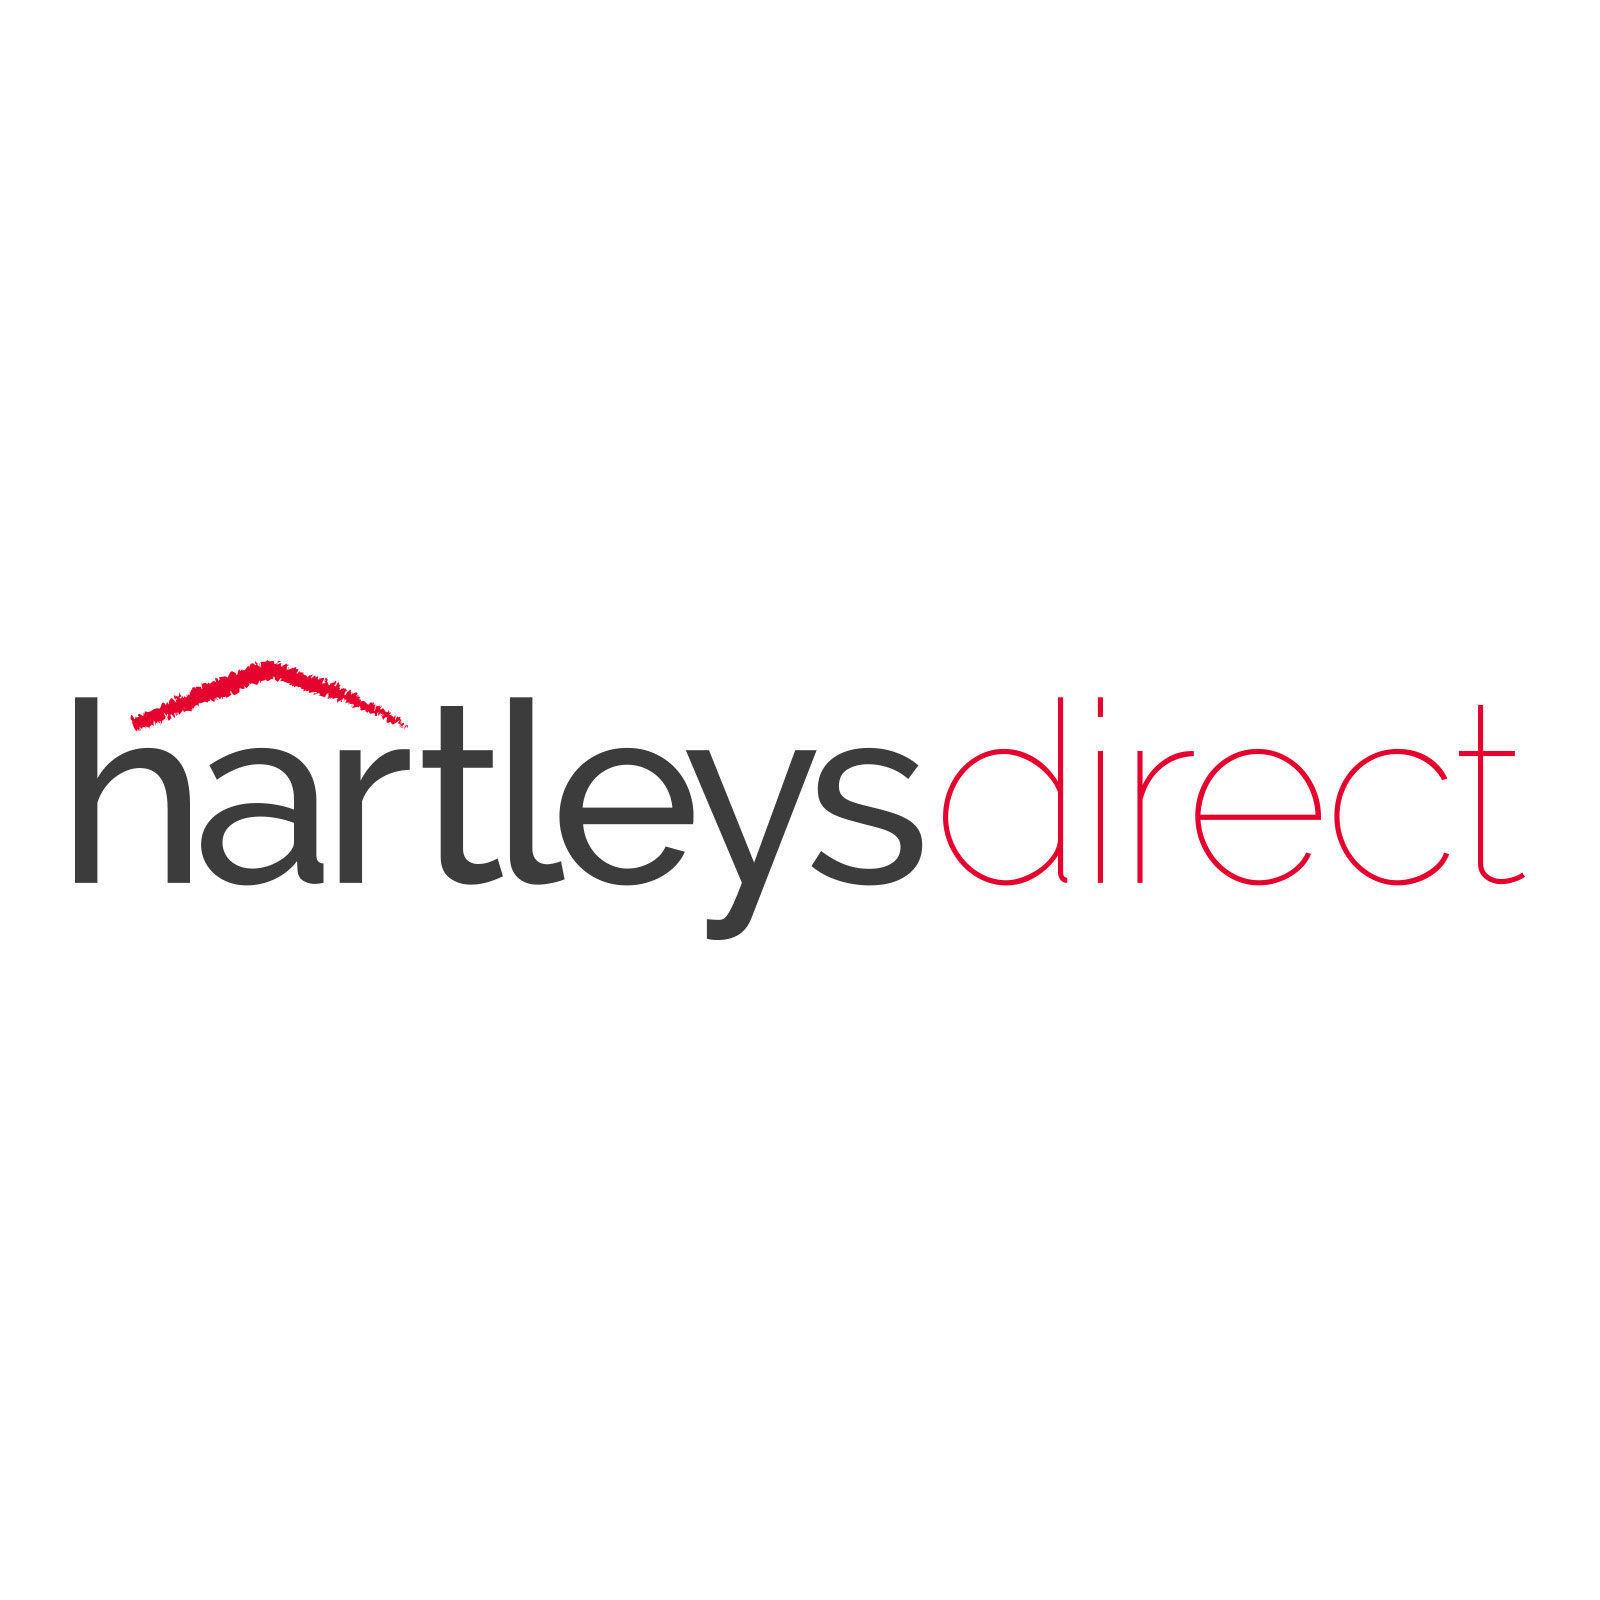 Hartleys-Set-of-Four-Gunmetal-Grey-Tall-Metal-Stools-on-White-Background.jpg